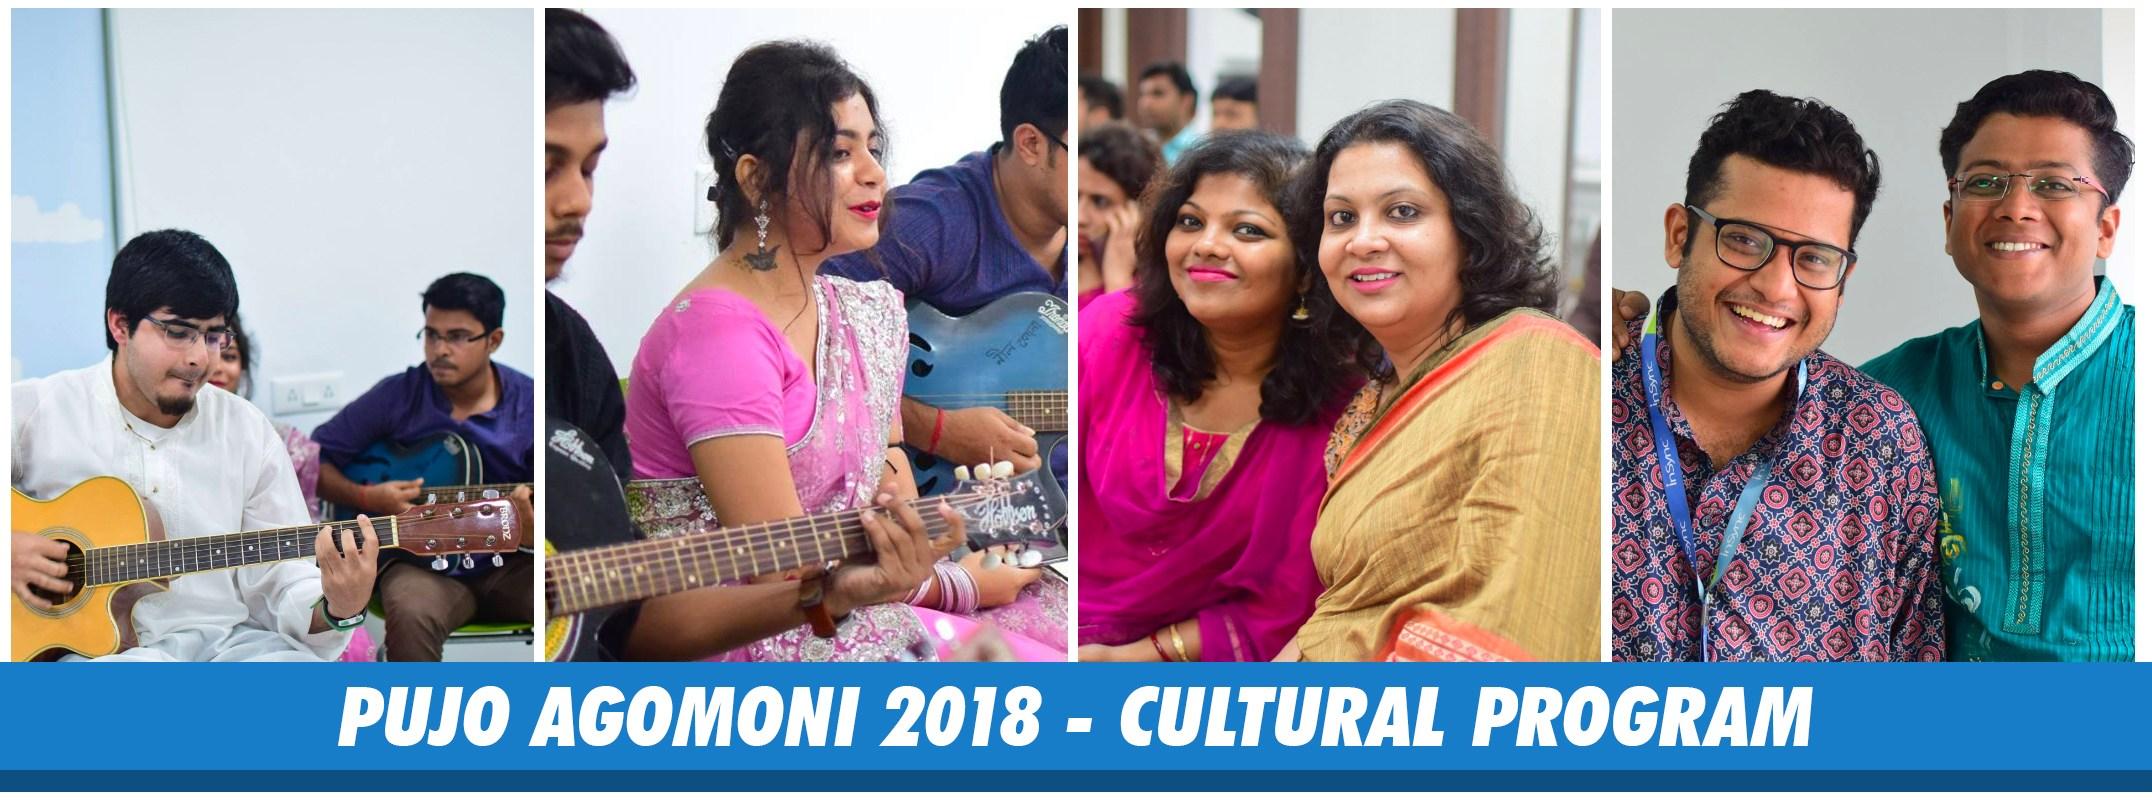 Durga-Pujo-Agomoni-2018-APPSeCONNECT